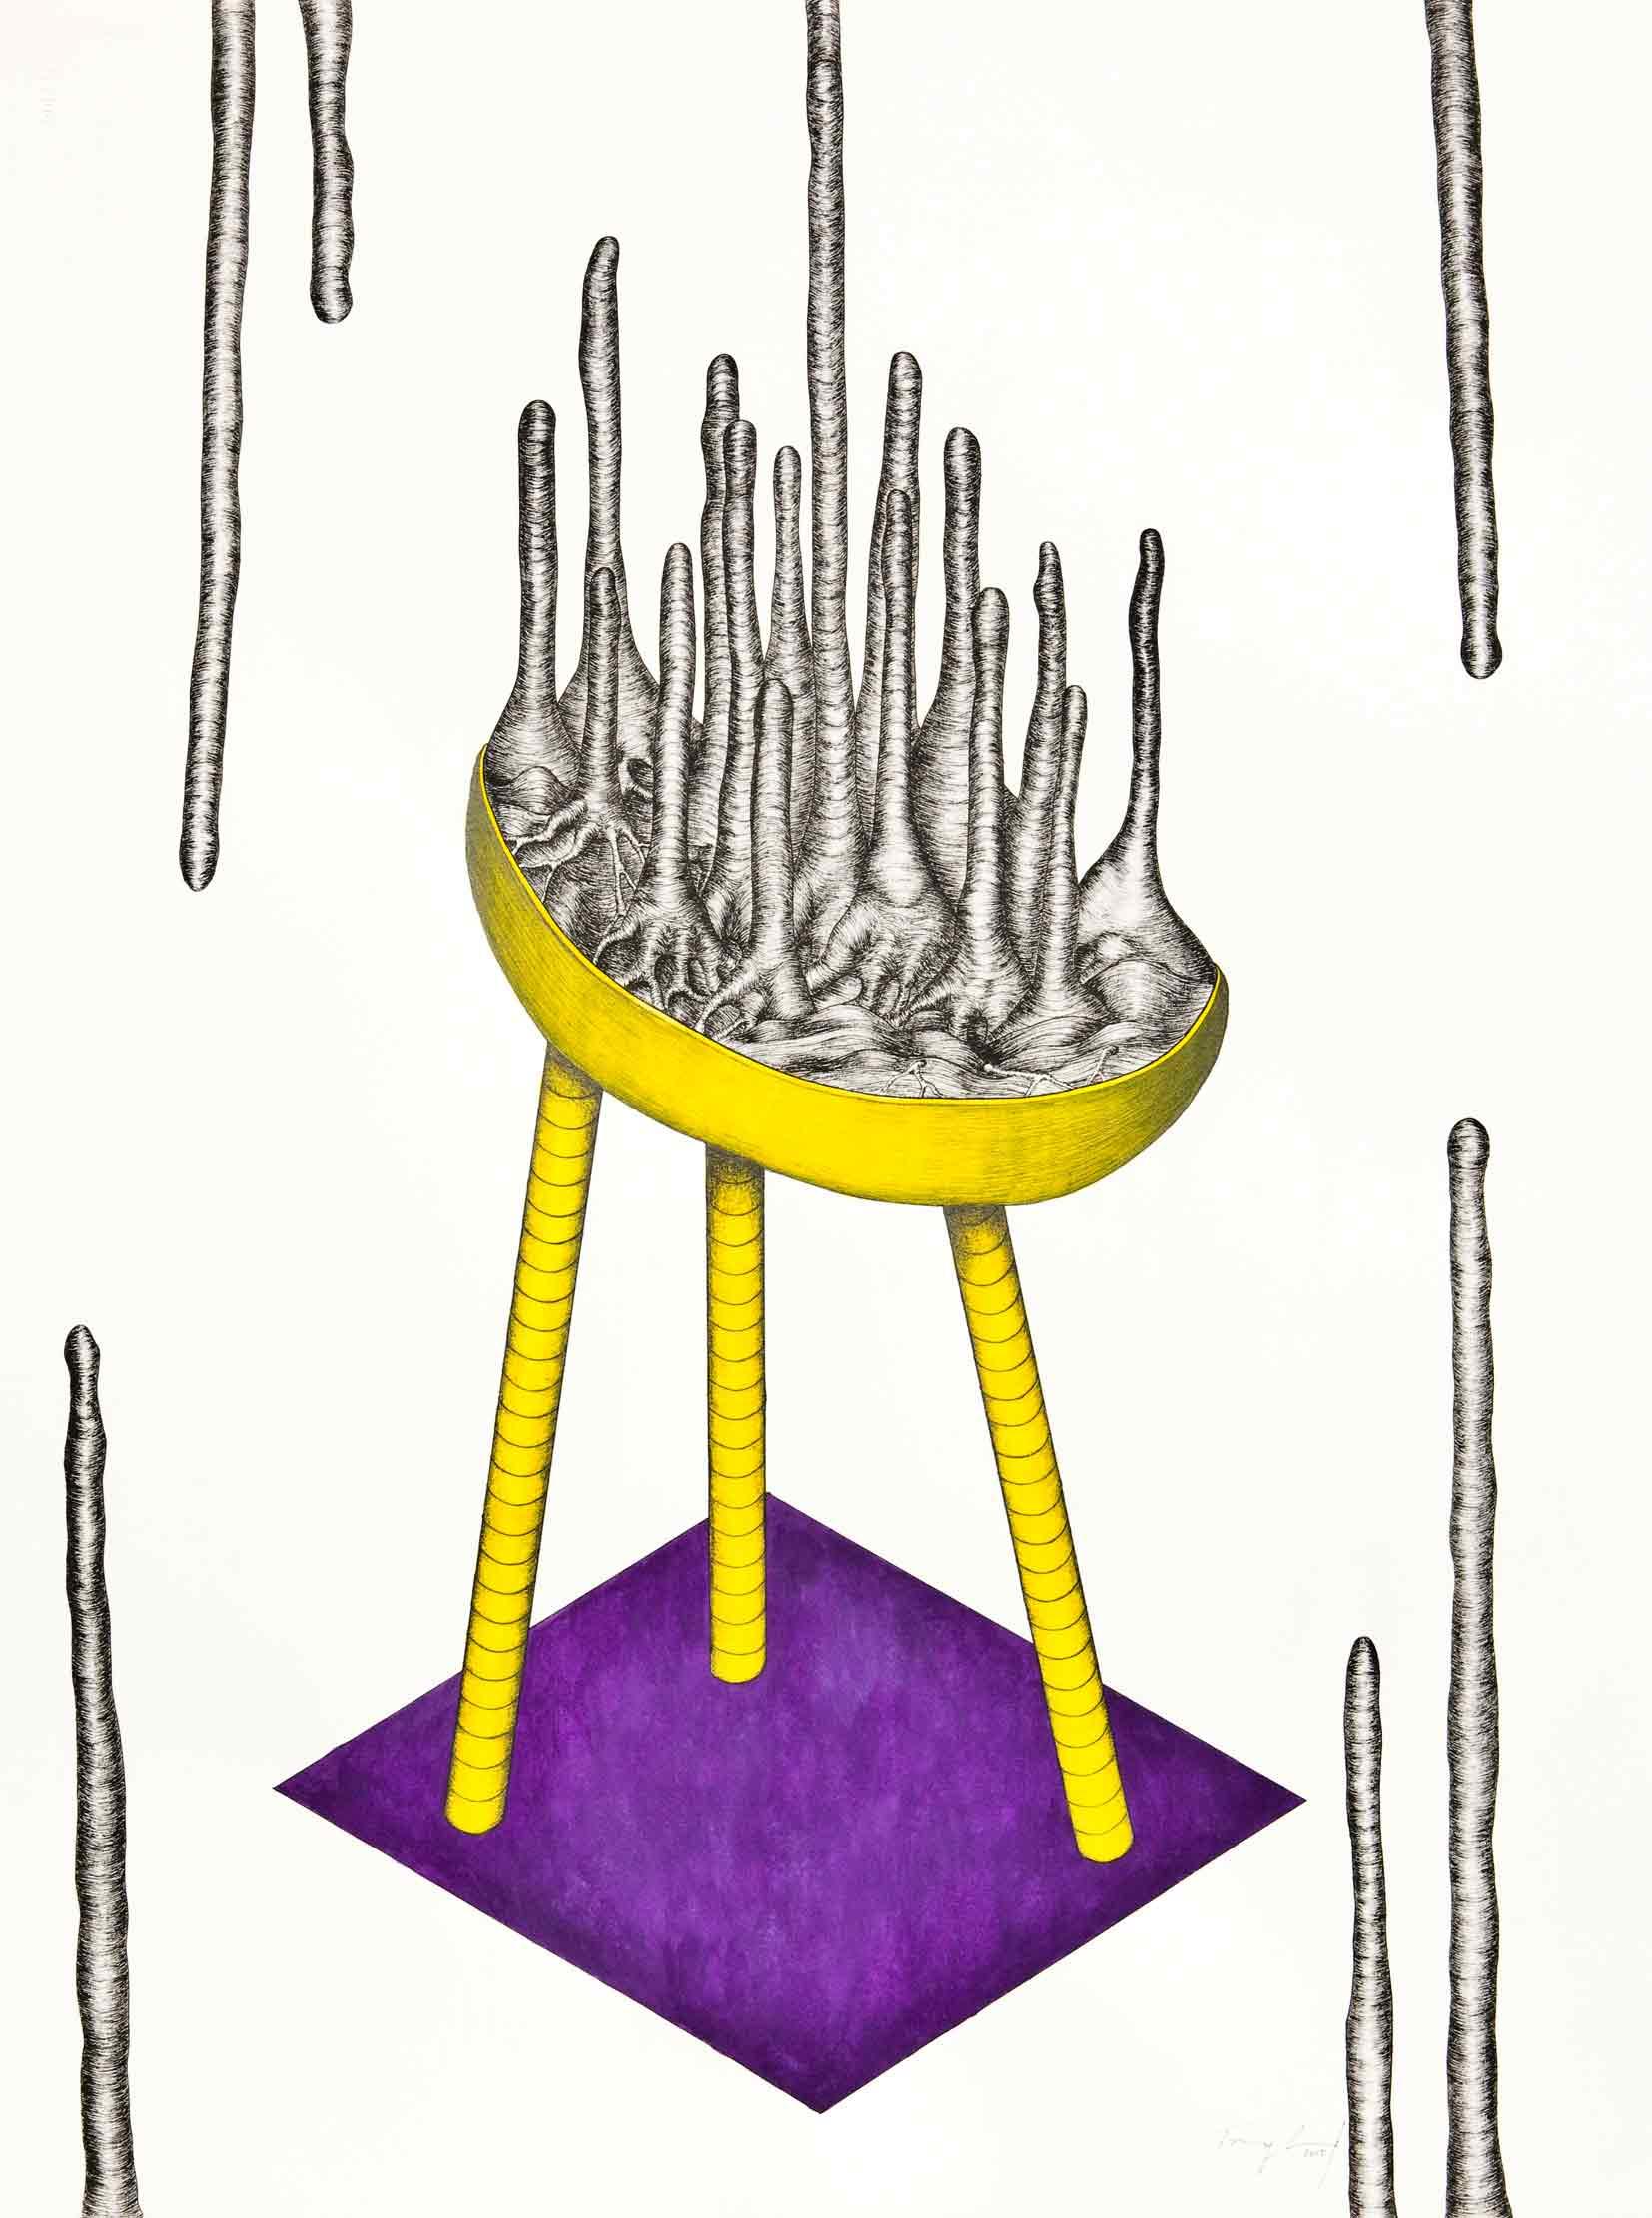 TRACY SARROFF   Balloon Drumstick  2015 Gouache, archival pen on paper 76 x 56 cm